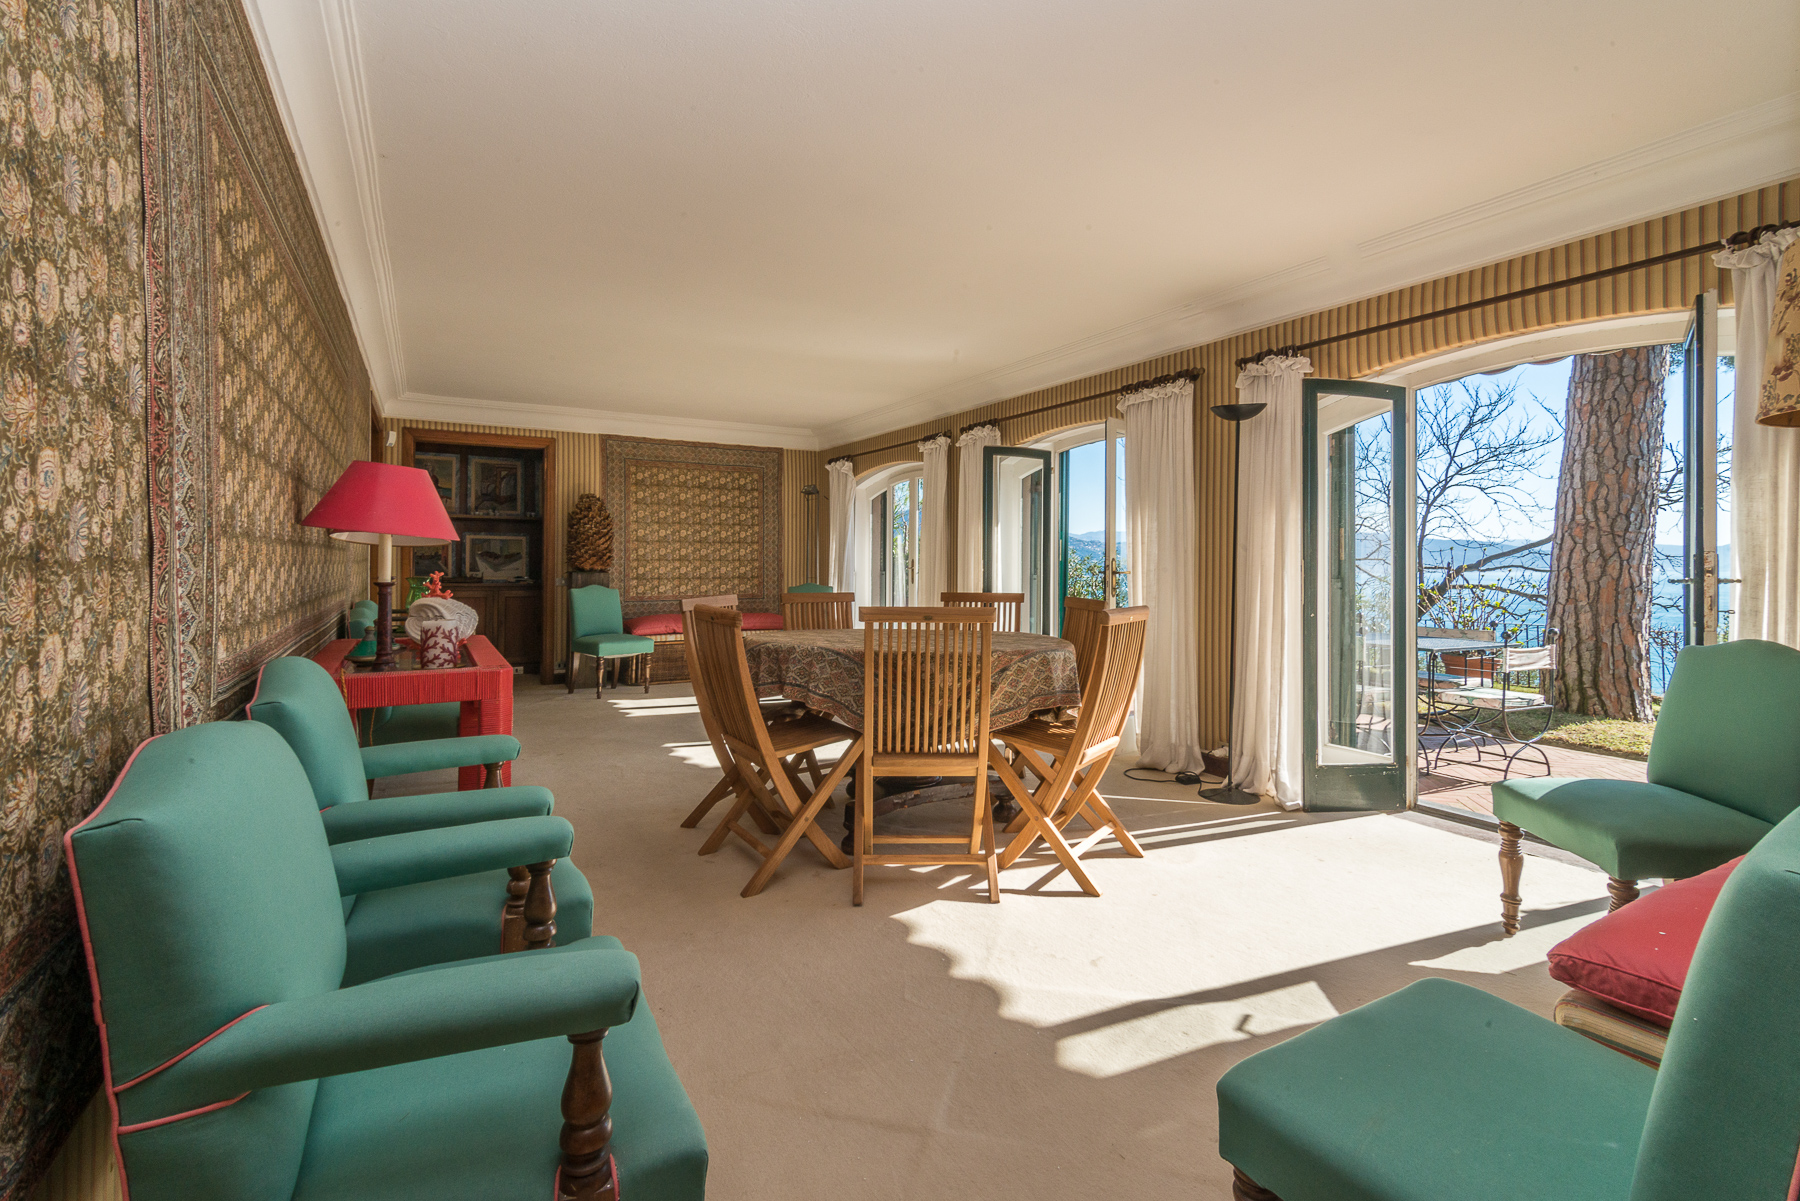 Villa in Vendita a Santa Margherita Ligure: 5 locali, 440 mq - Foto 9